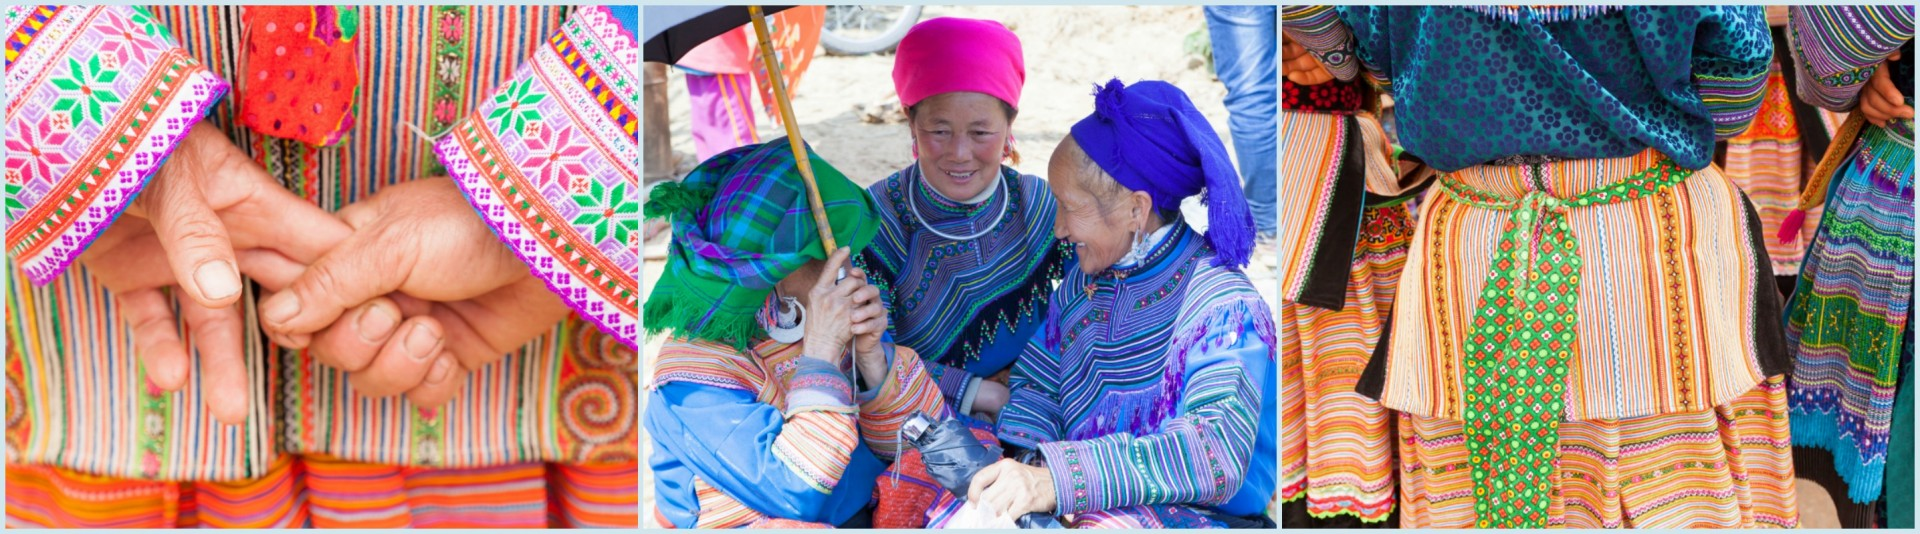 Vietnam lilian vezin photographie 6